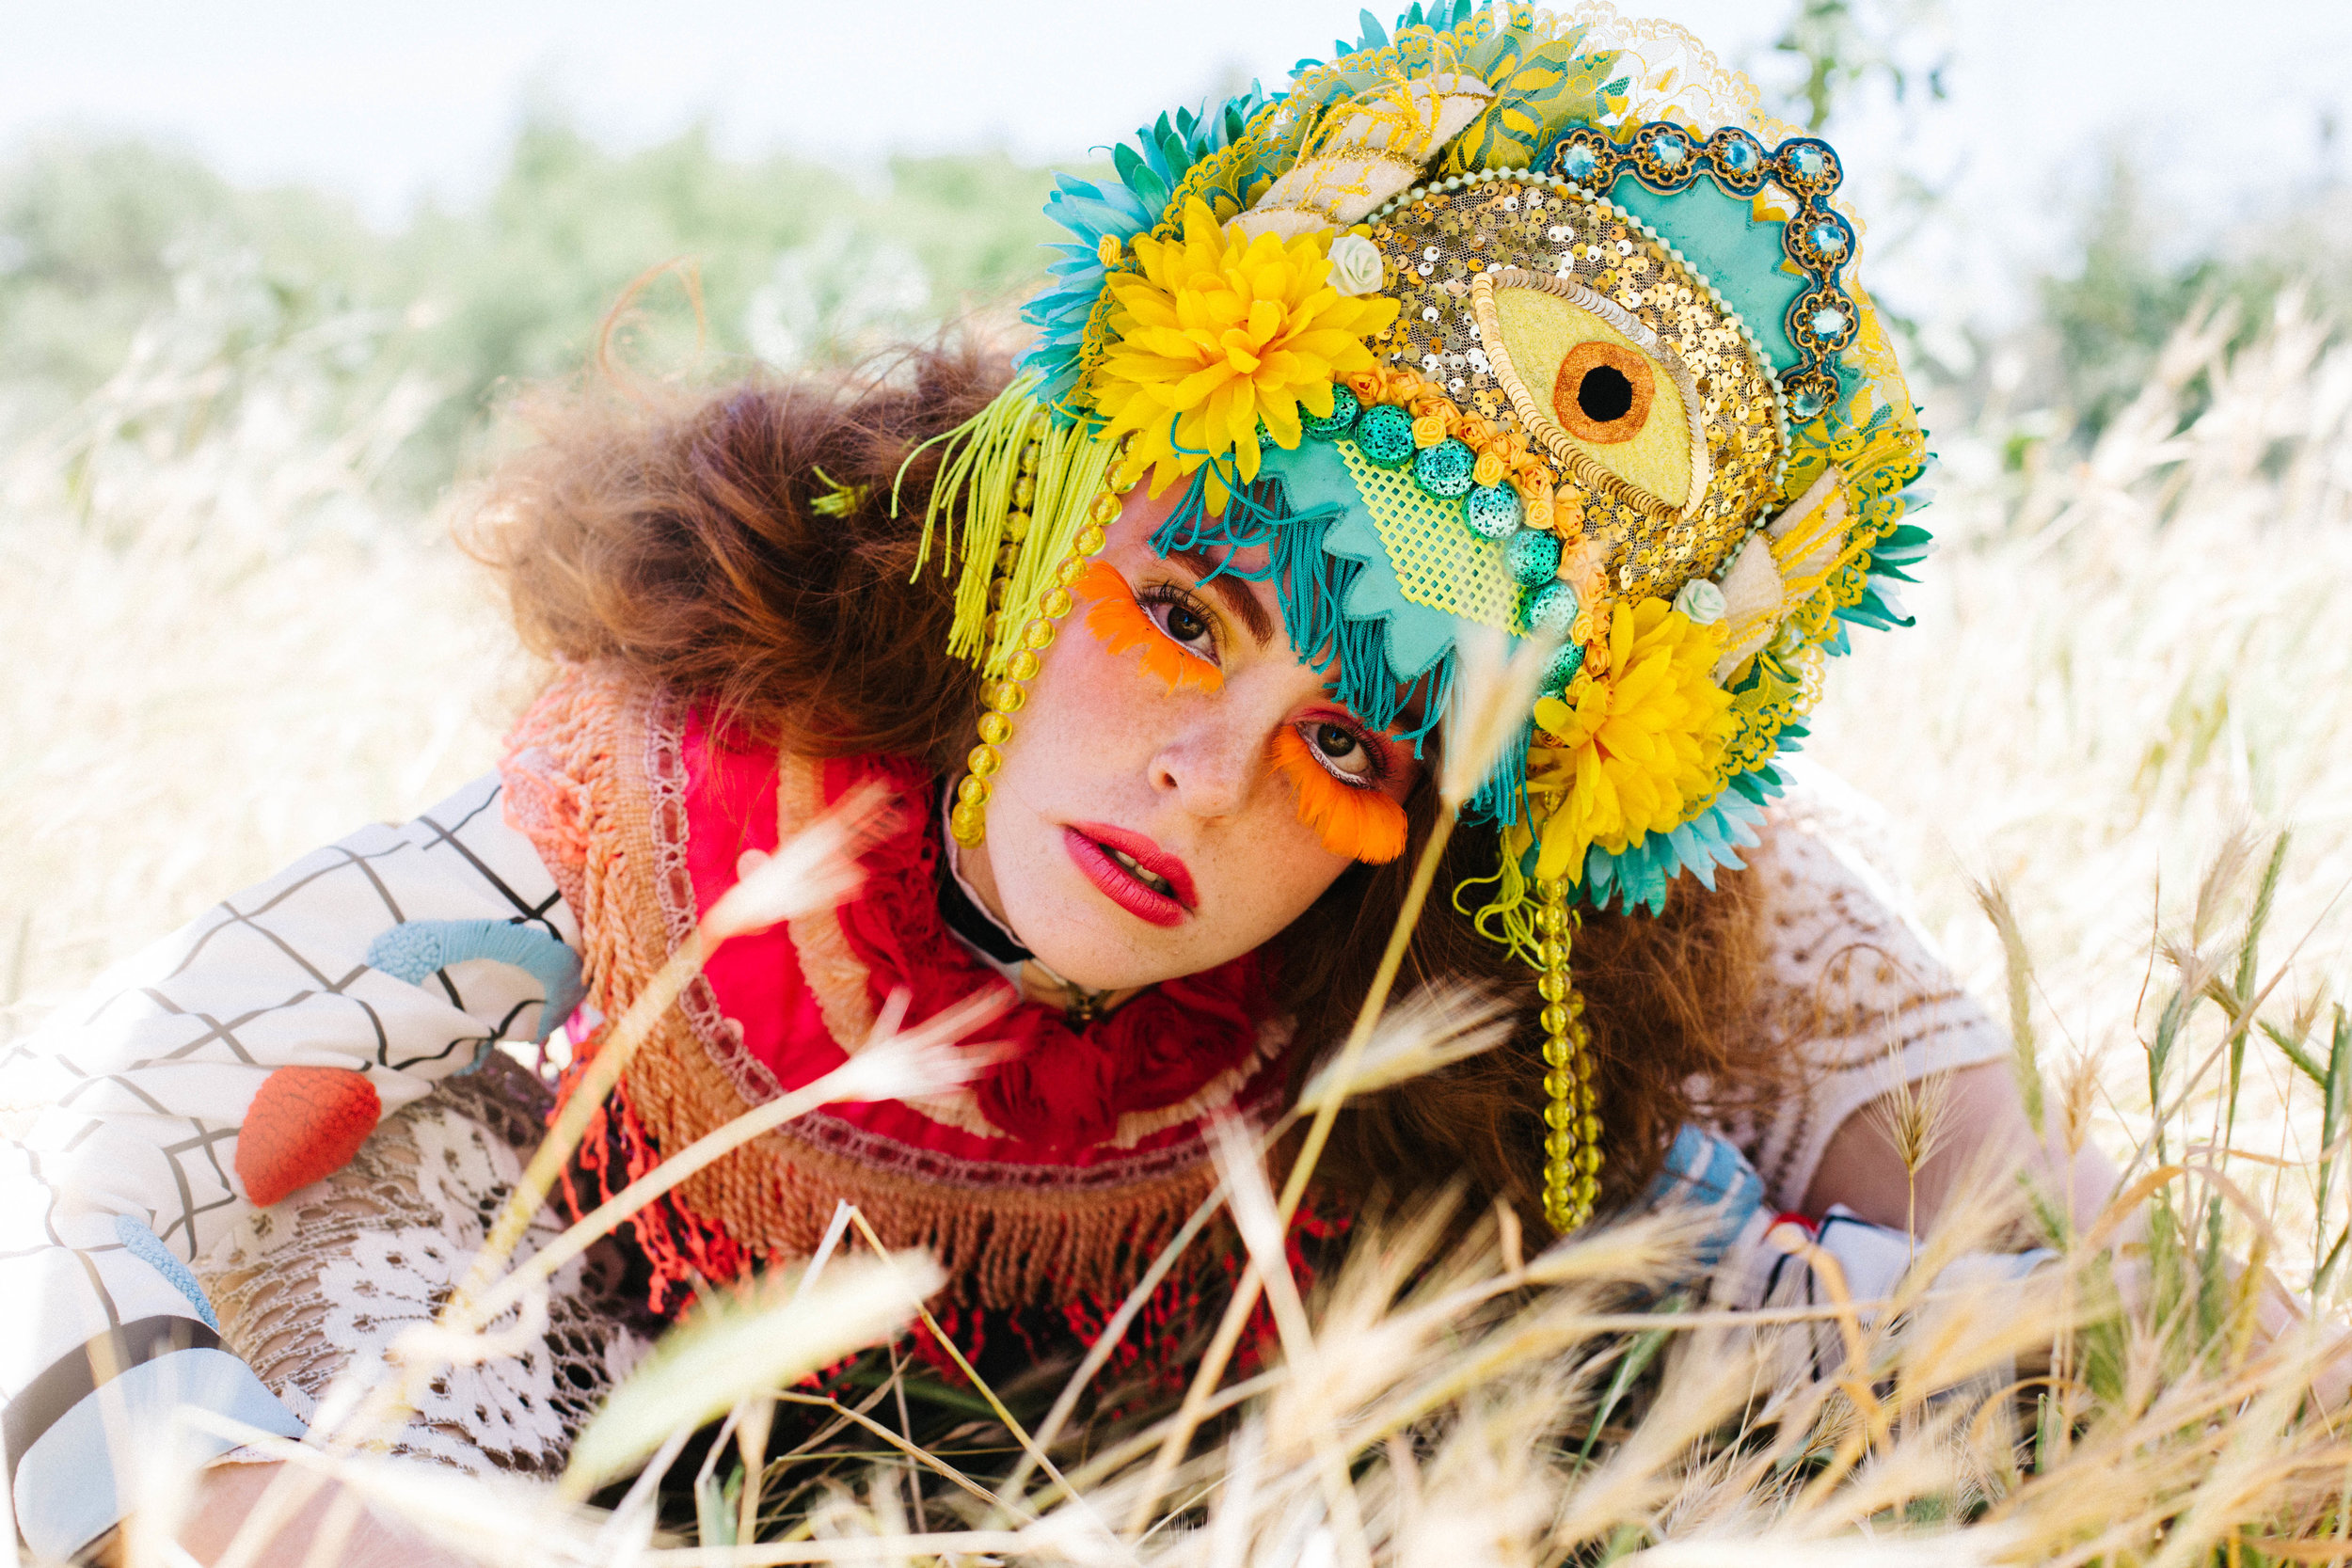 Alice & Wonderland_17-319-5.jpg